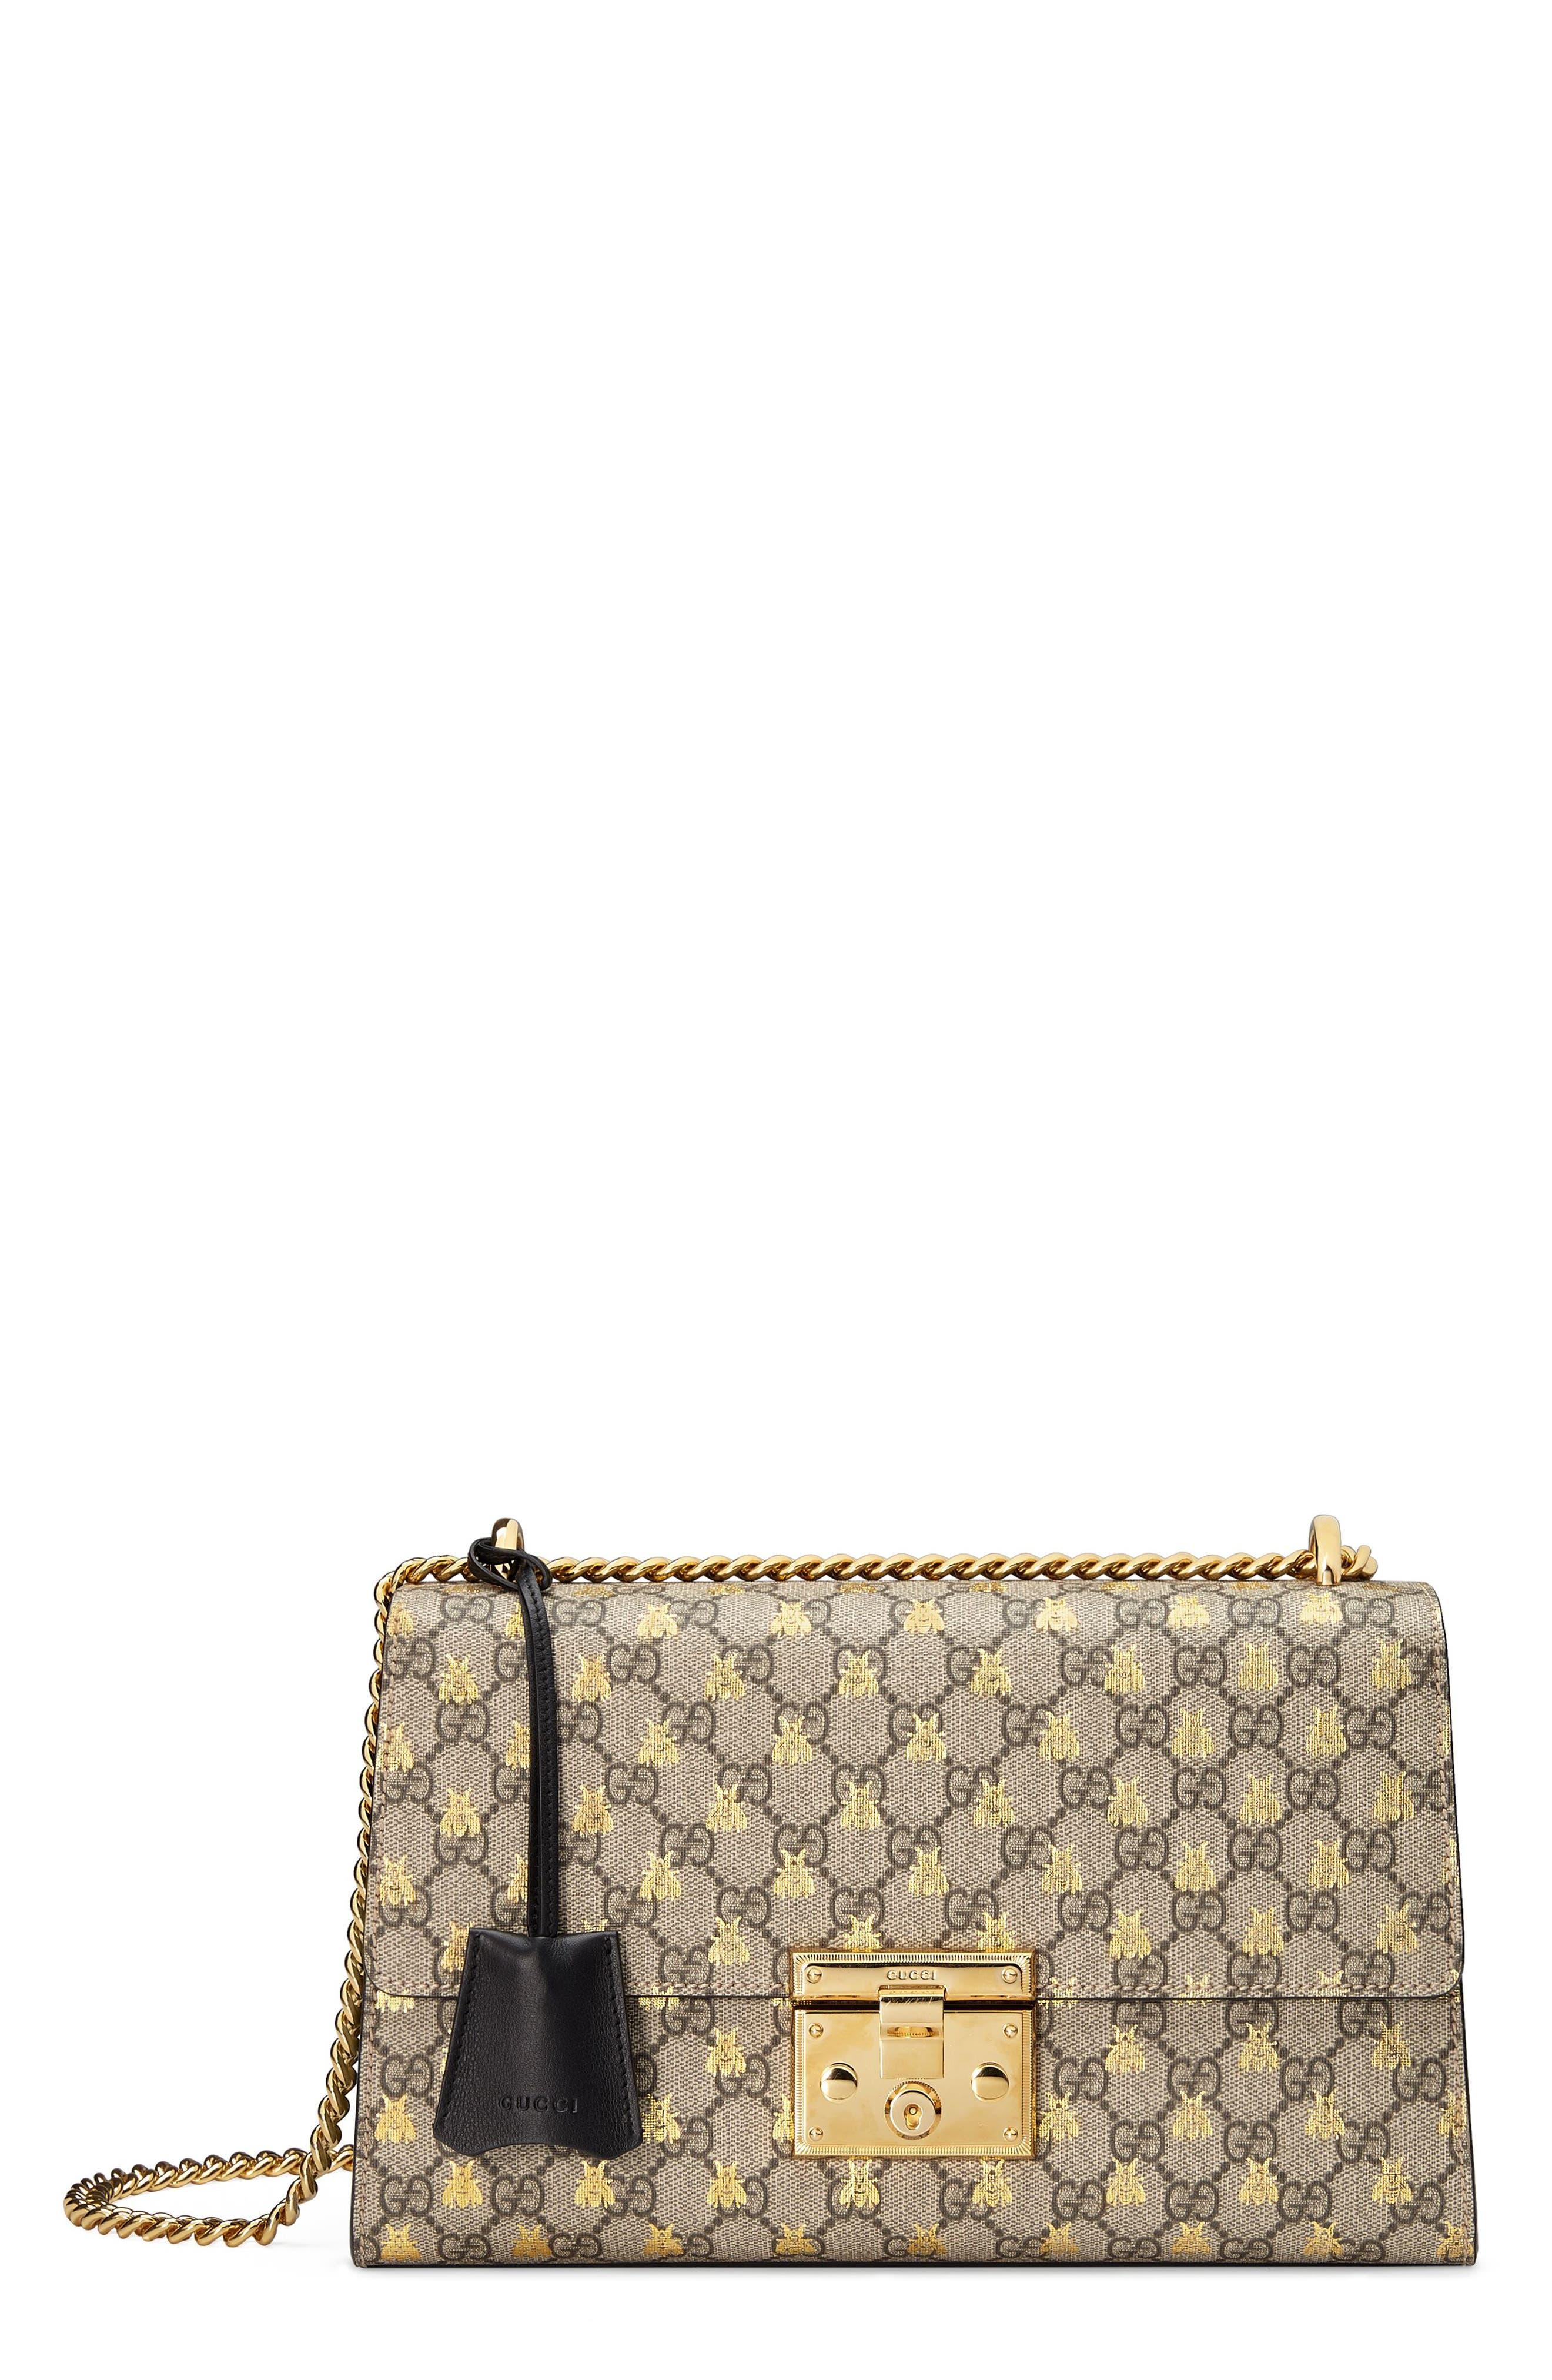 Medium Padlock GG Supreme Bee Shoulder Bag,                             Main thumbnail 1, color,                             250